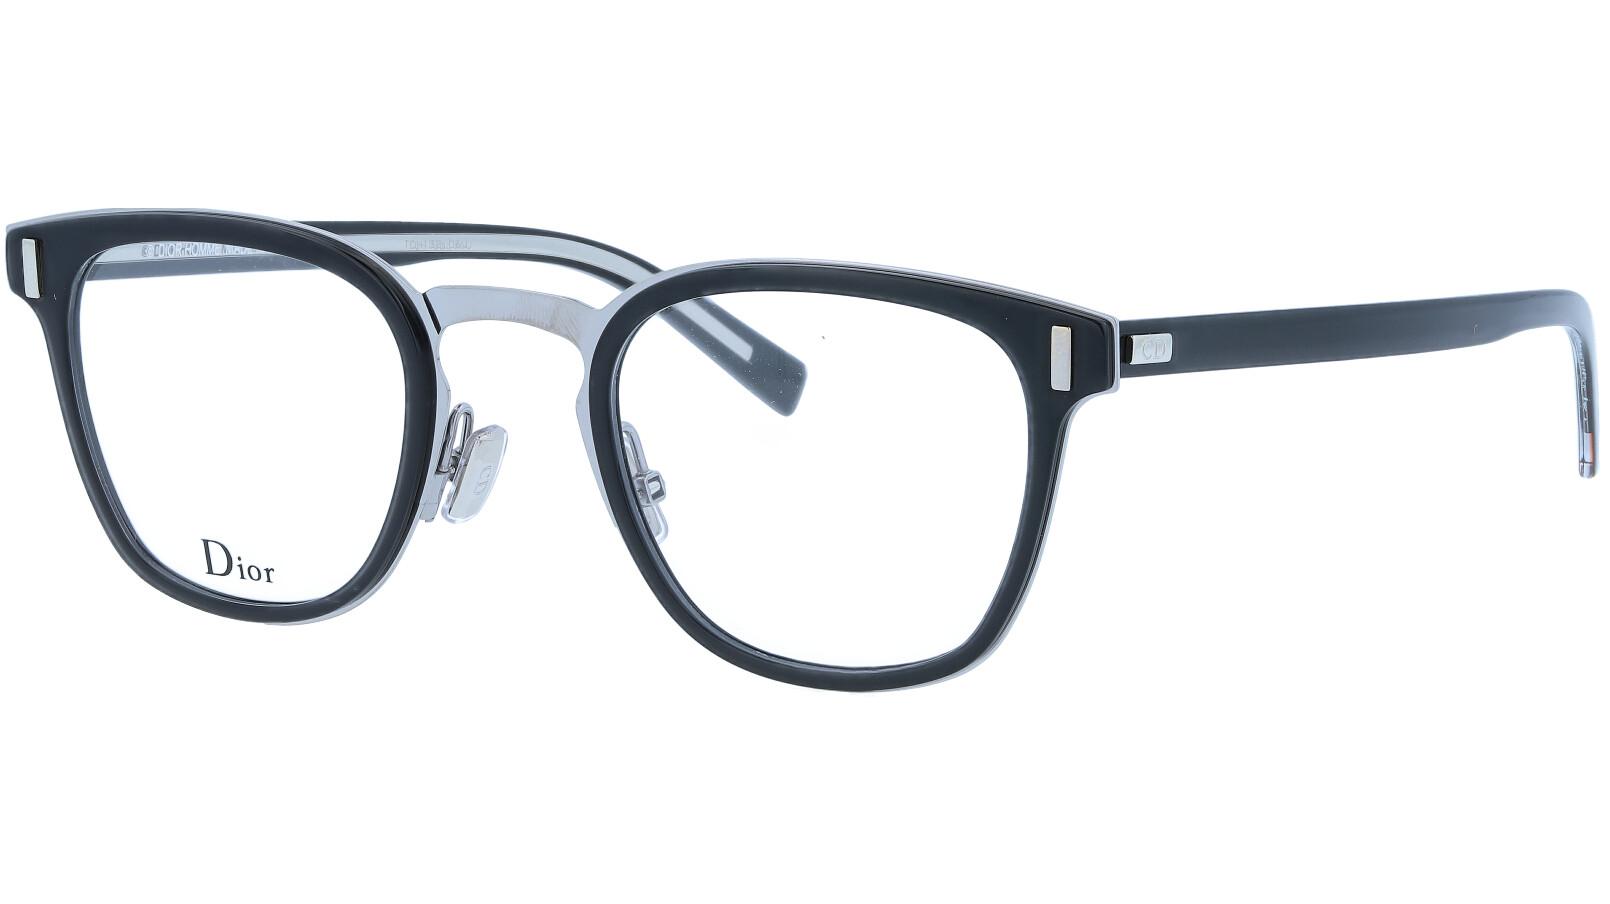 DIOR BLACKTIE2.0O 807 48 BLACK Glasses